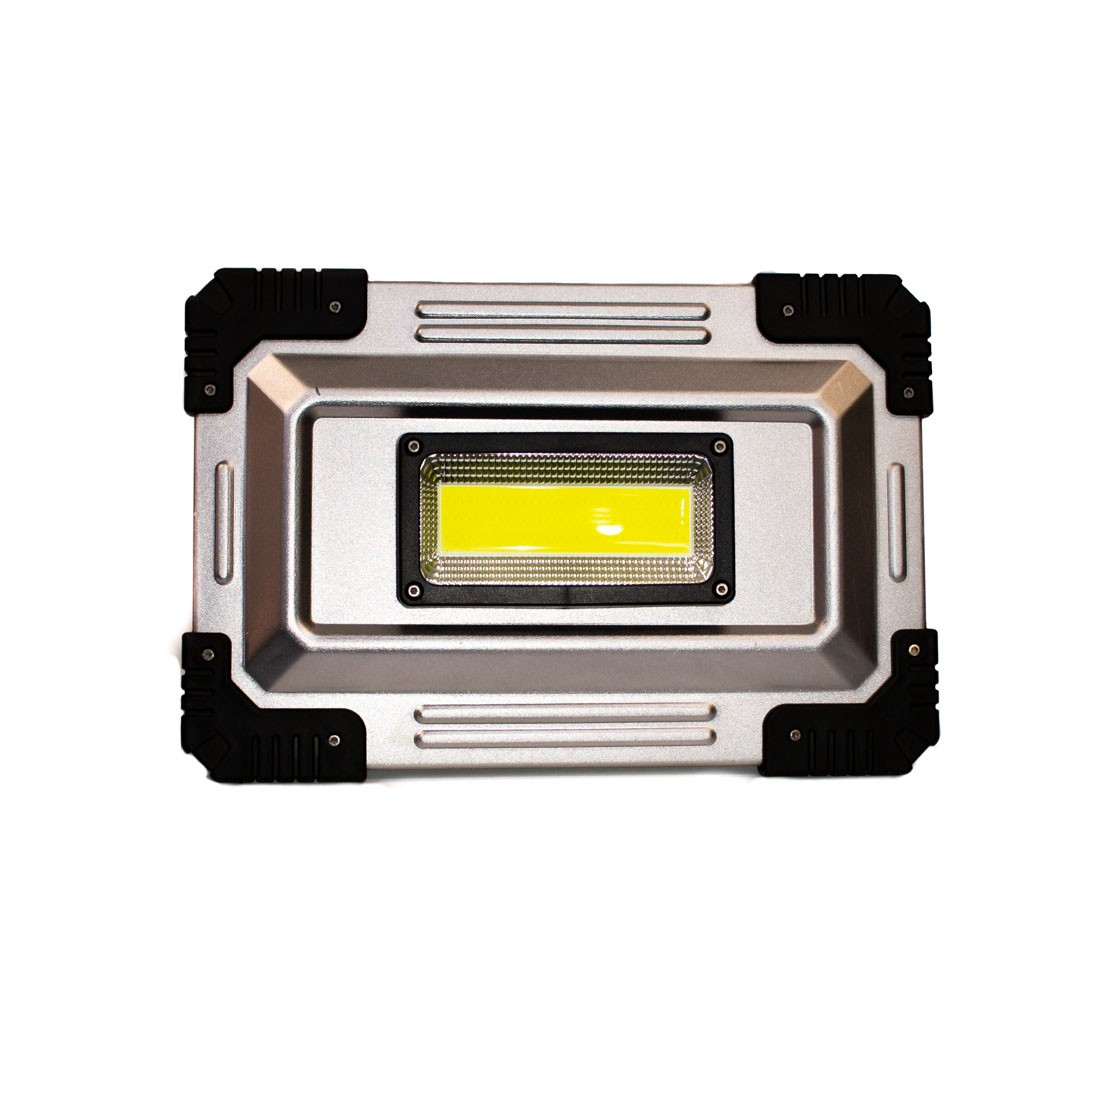 LED Лампа 30W с аккумулятором W826 оптом